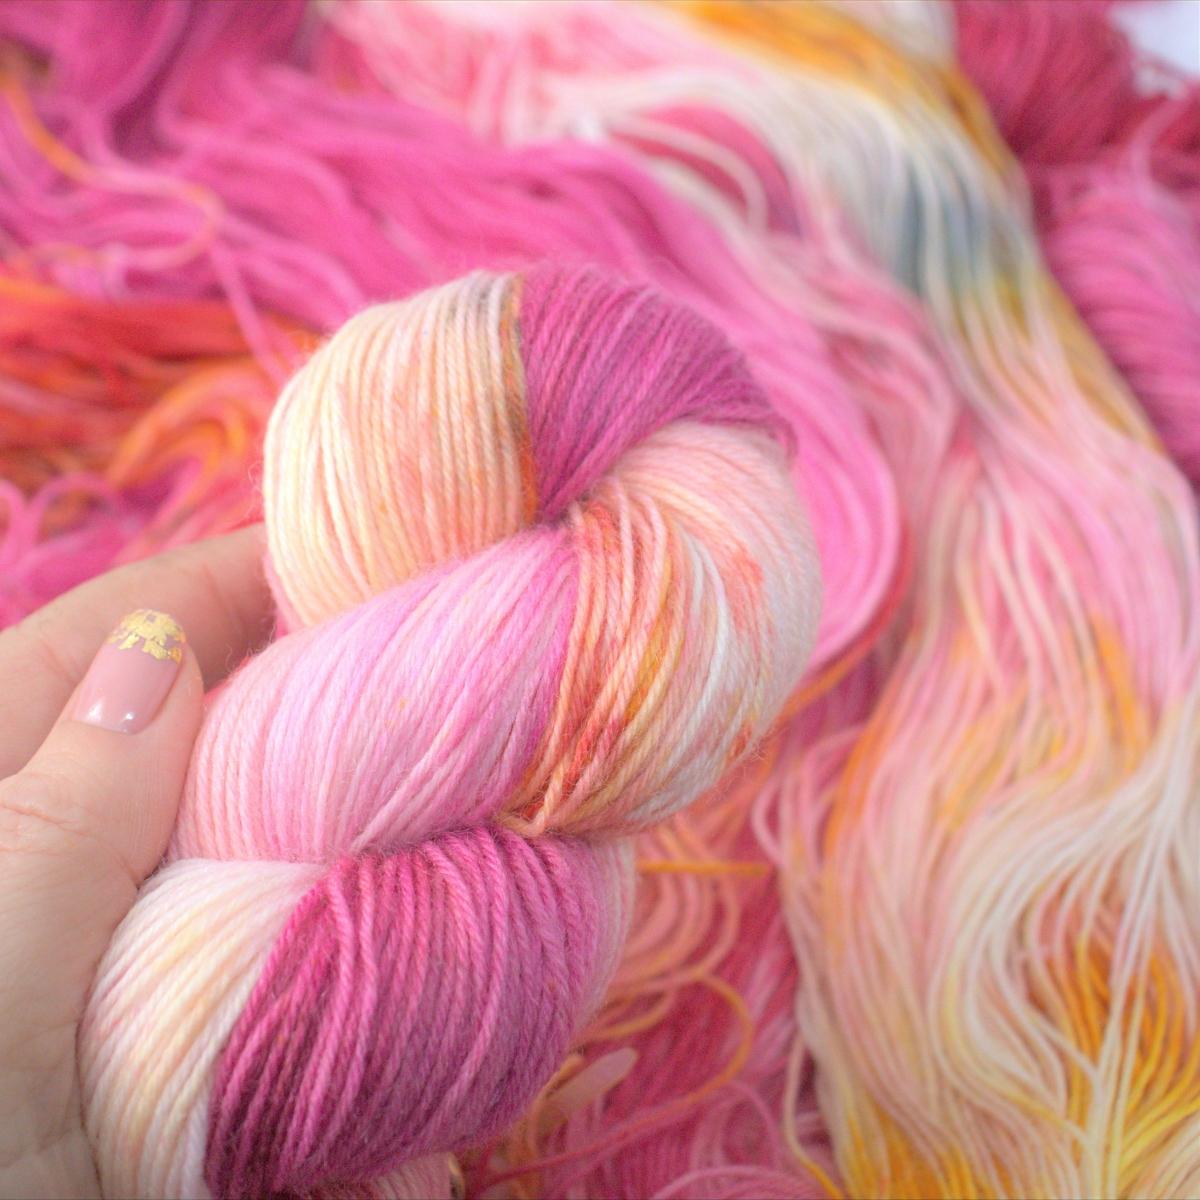 woodico.pro hand dyed yarn 053 3 1200x1200 - Hand dyed yarn / 053